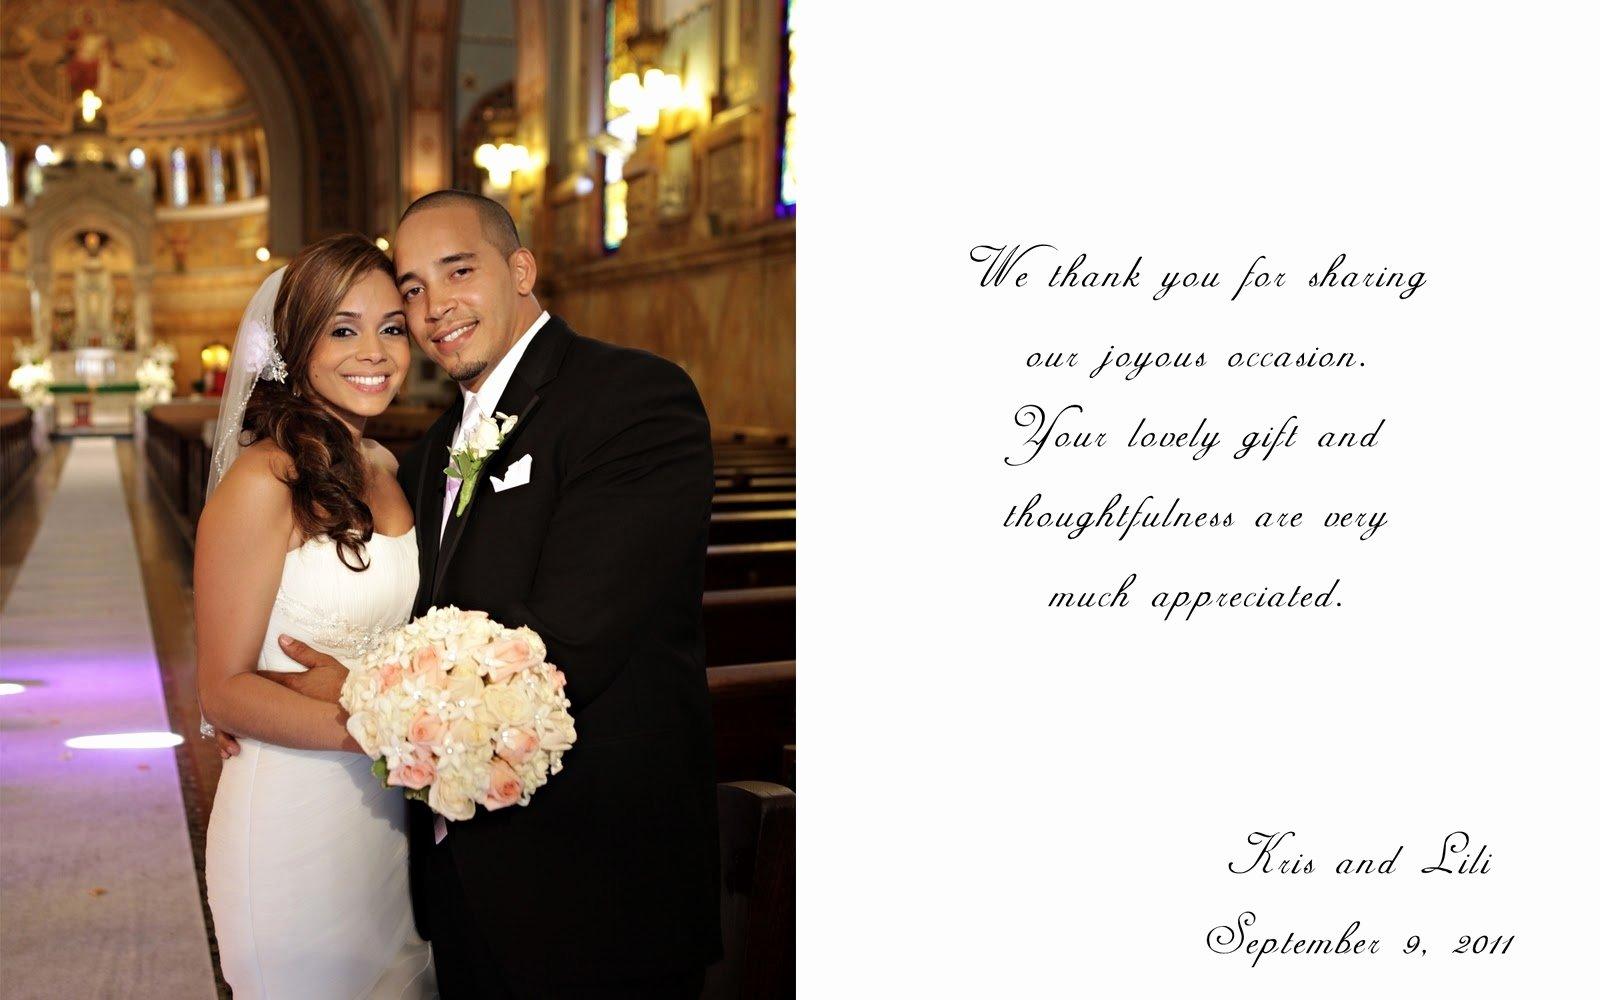 10 Lovely Wedding Thank You Card Ideas 18 fresh wedding thank you card wording wedding idea with keyword 2020